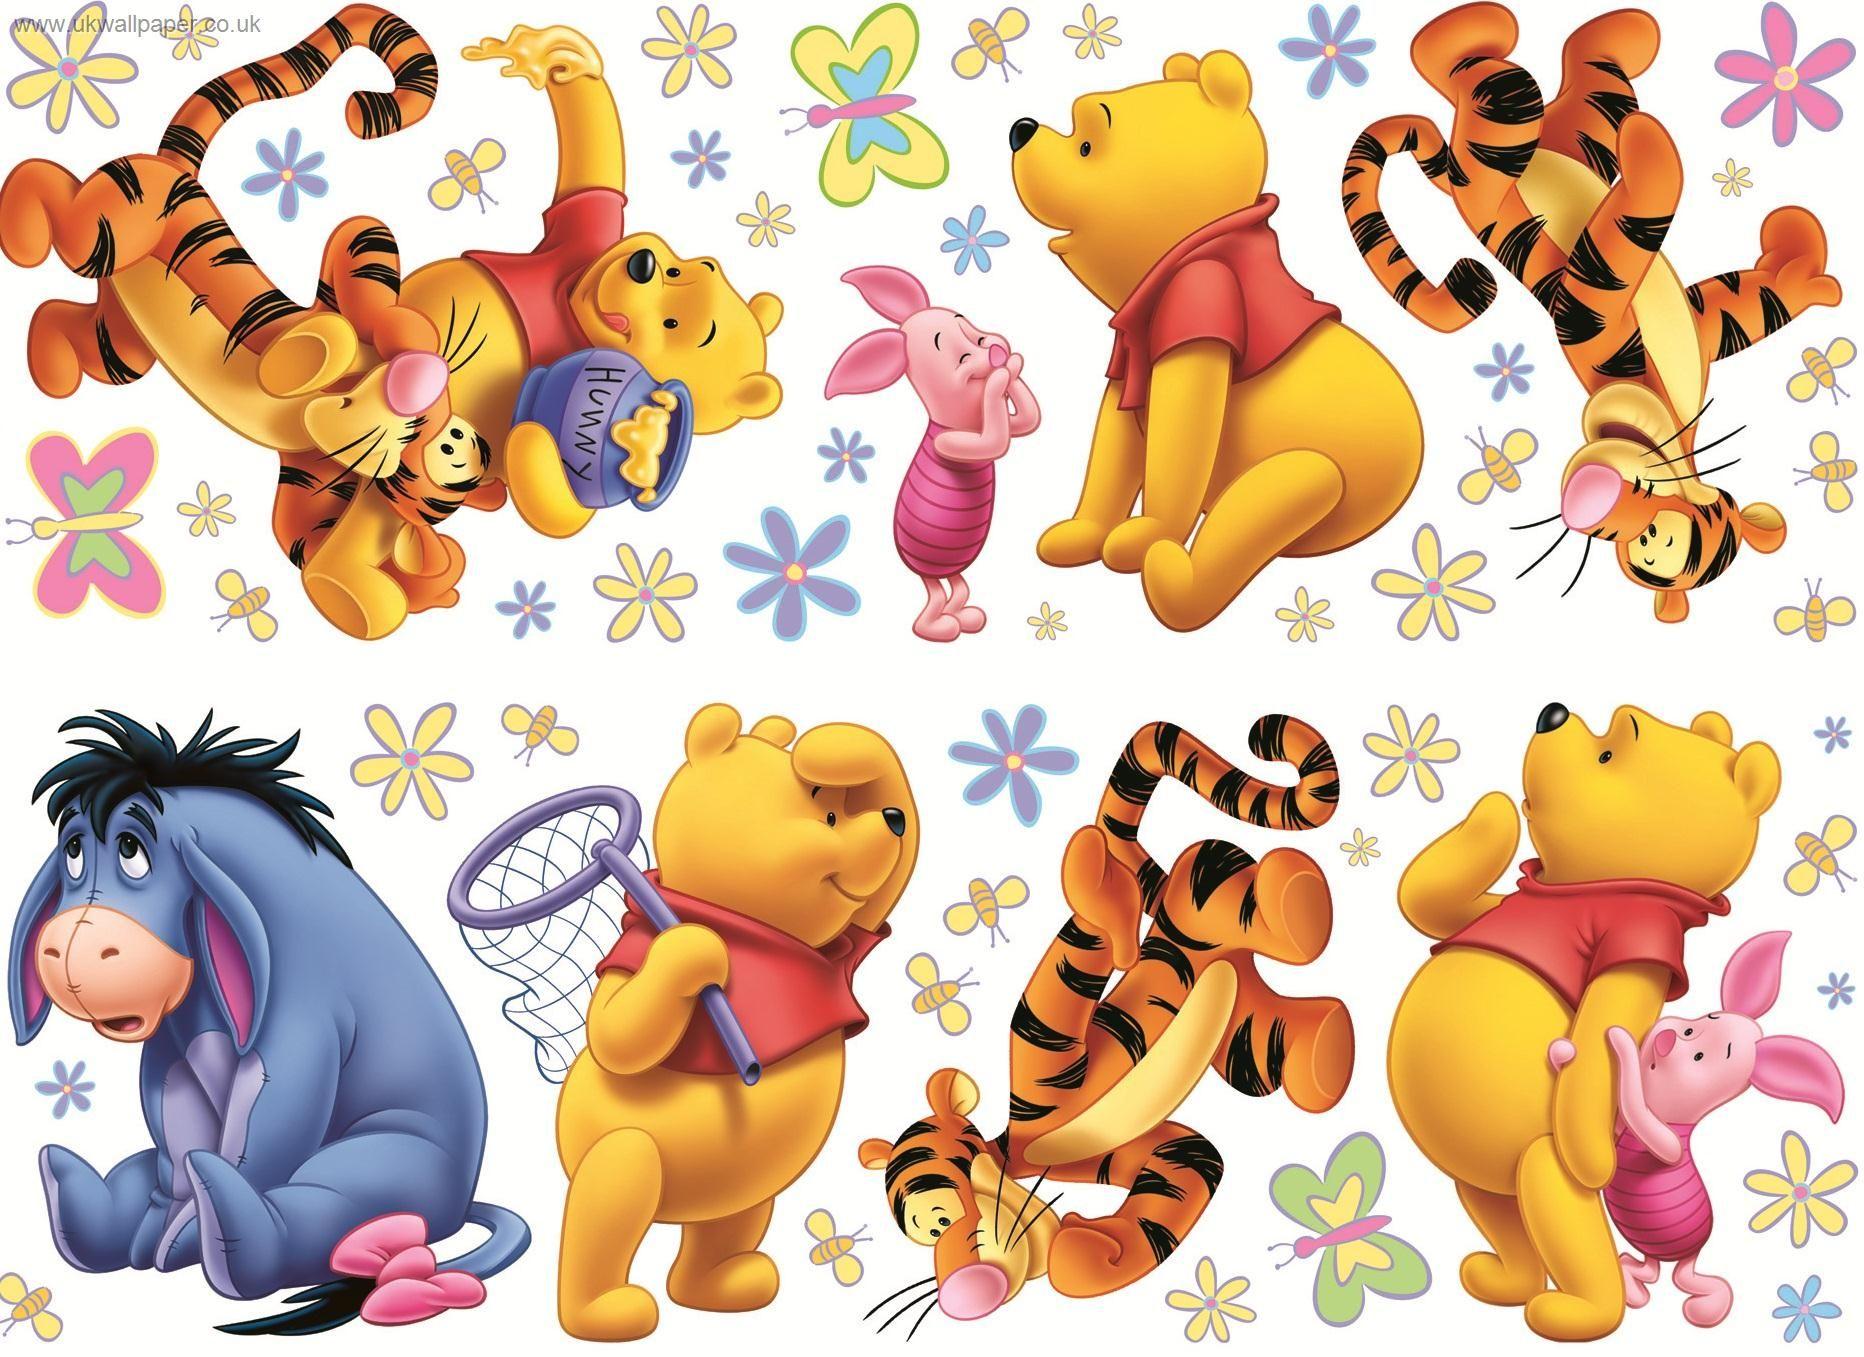 Eur 6,90 a eur 19,90 +eur 6,90 di spedizione. Winnie The Pooh Wall Stickers Df40223b Winnie The Pooh